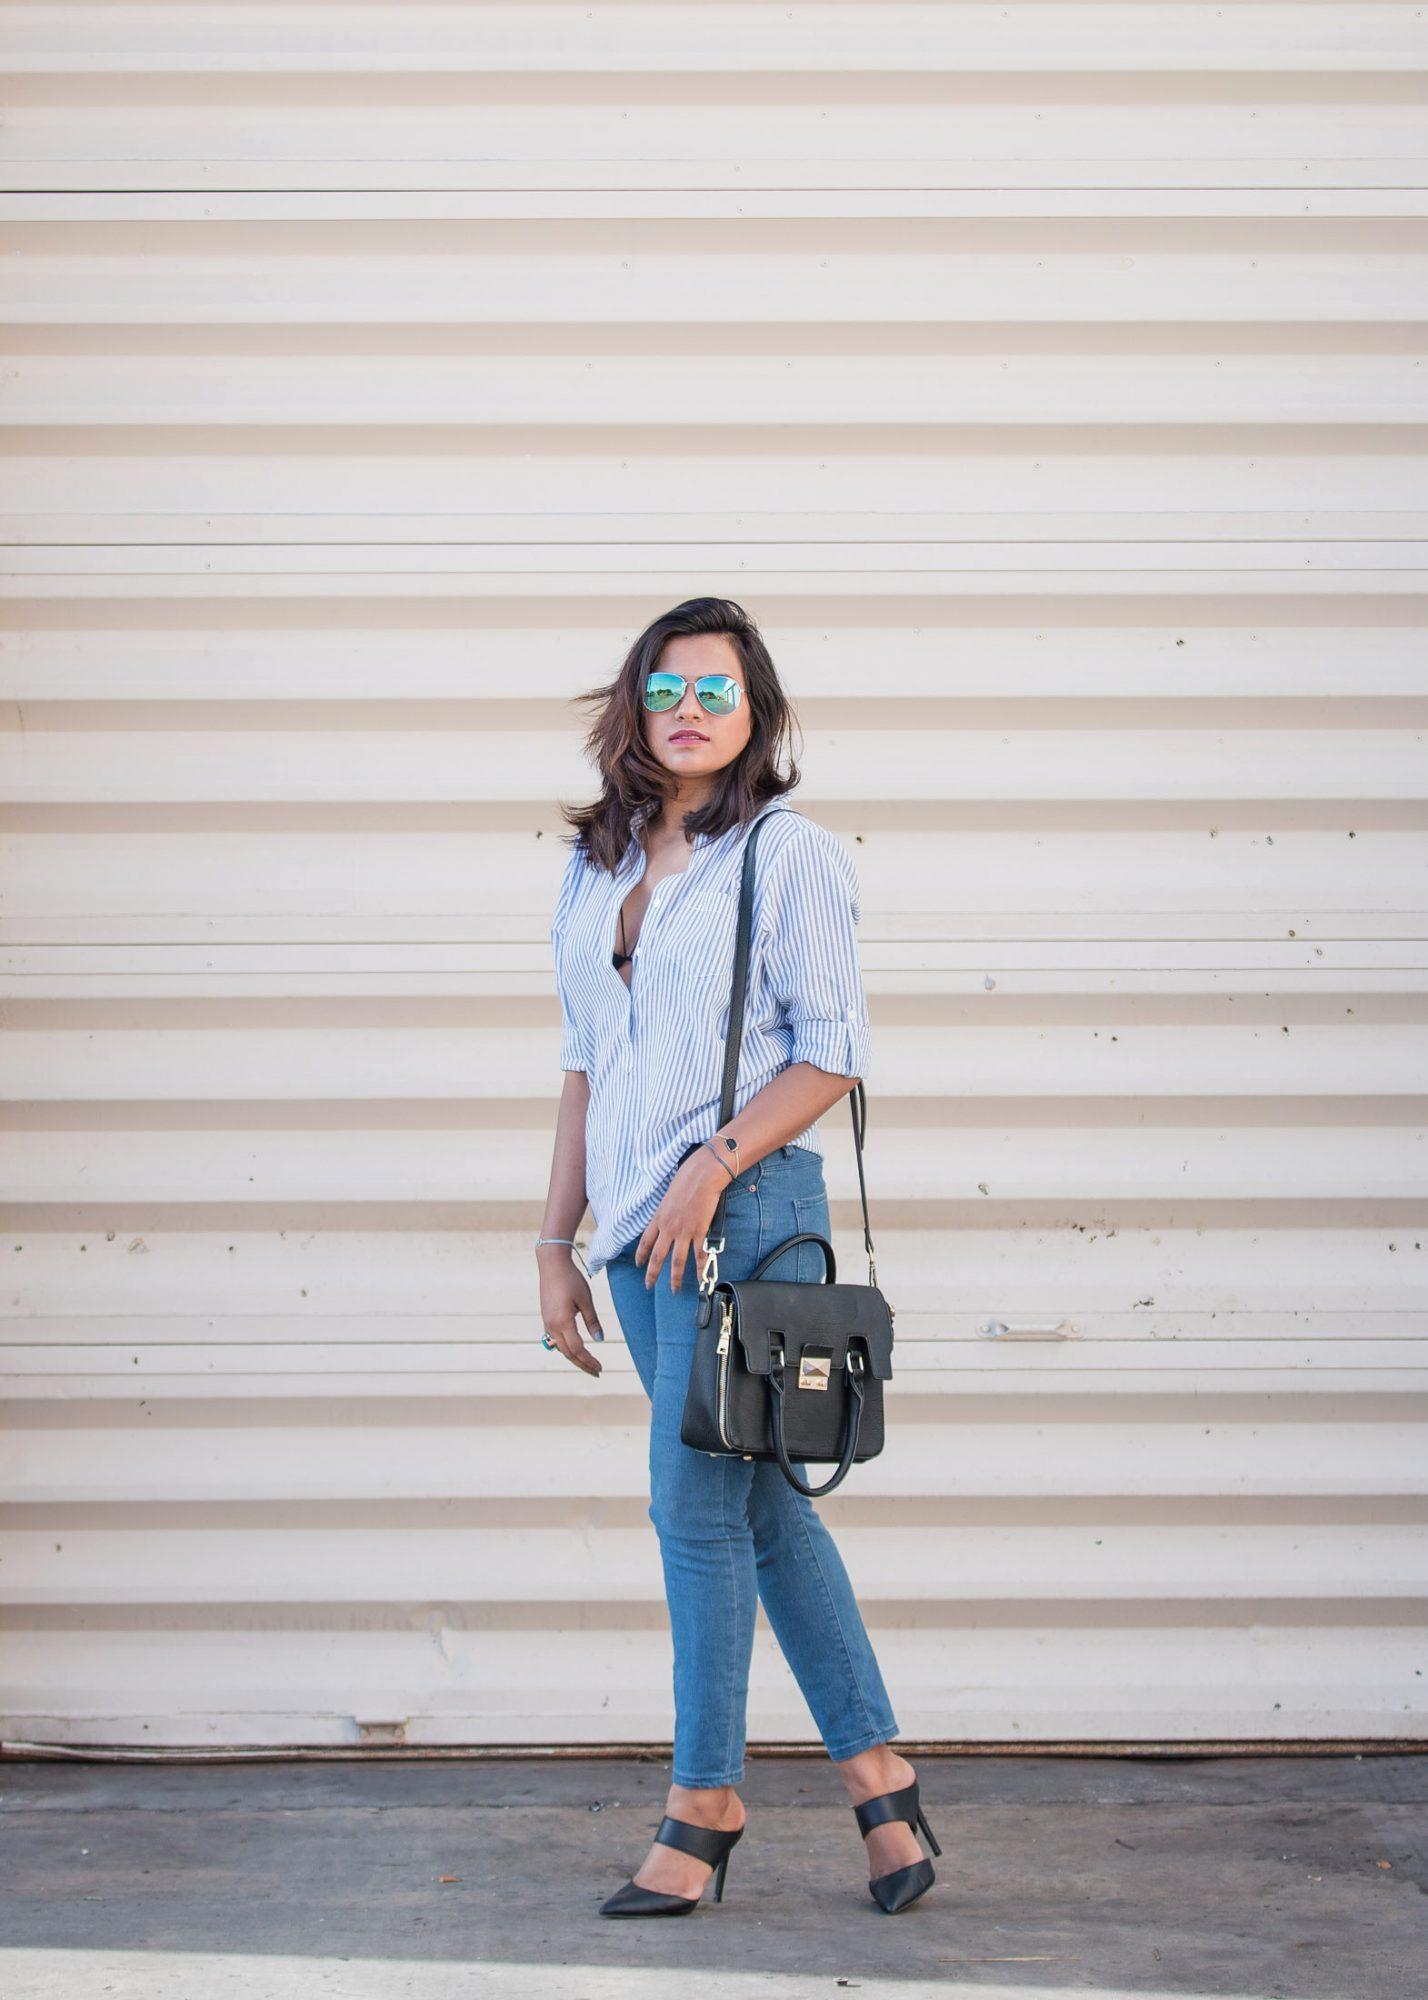 Miami Top Fashion Blogger Afroza Khan